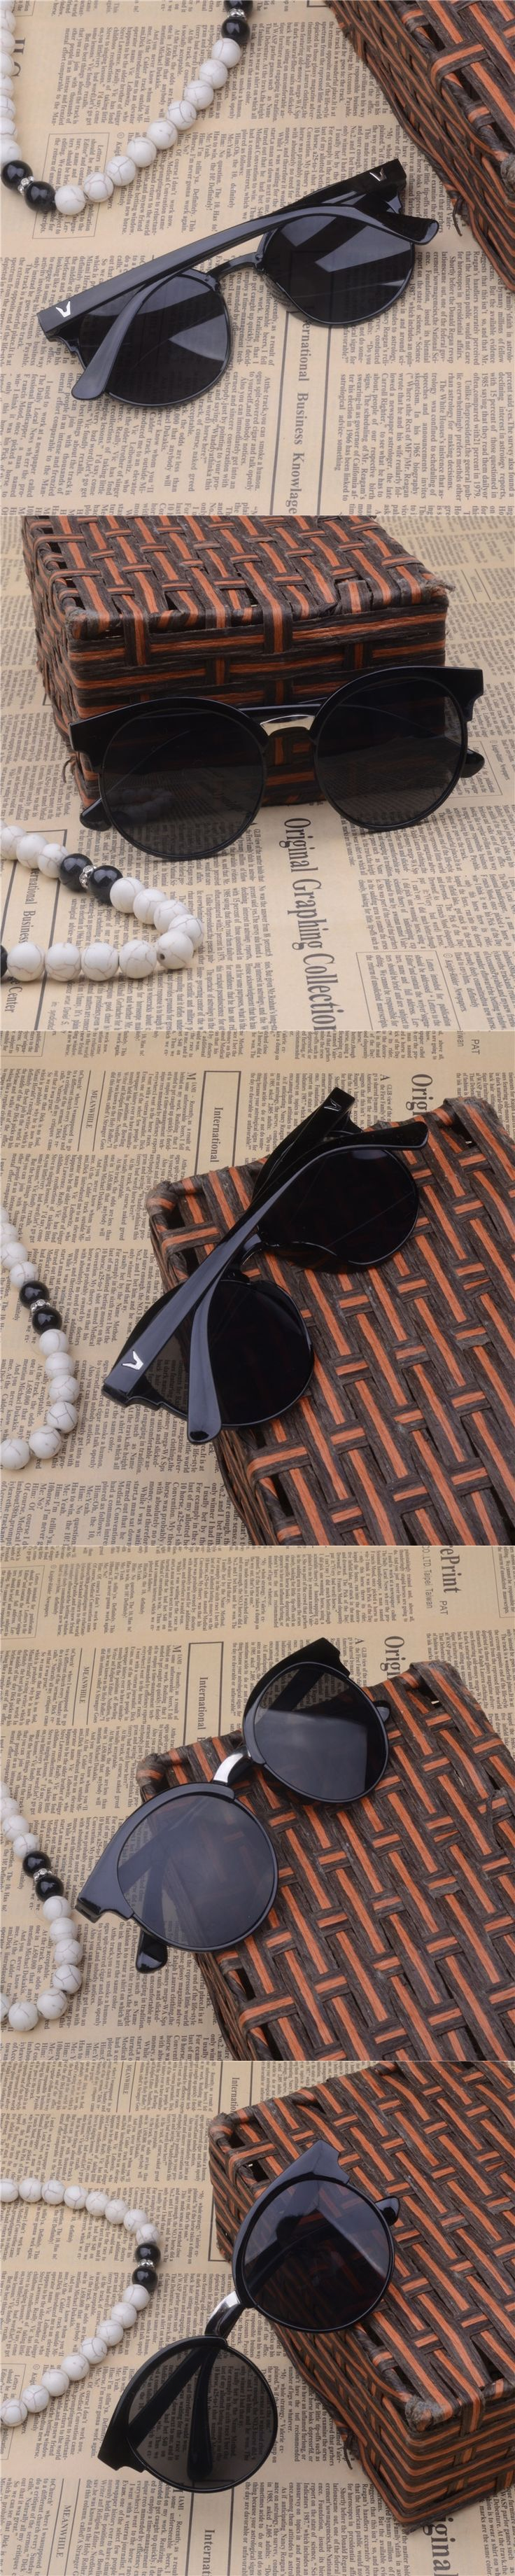 2016 free shipping New Vintage Summer Sunglasses Sun Glasses UV Protection Sunglasses Men Women Eyewear a147